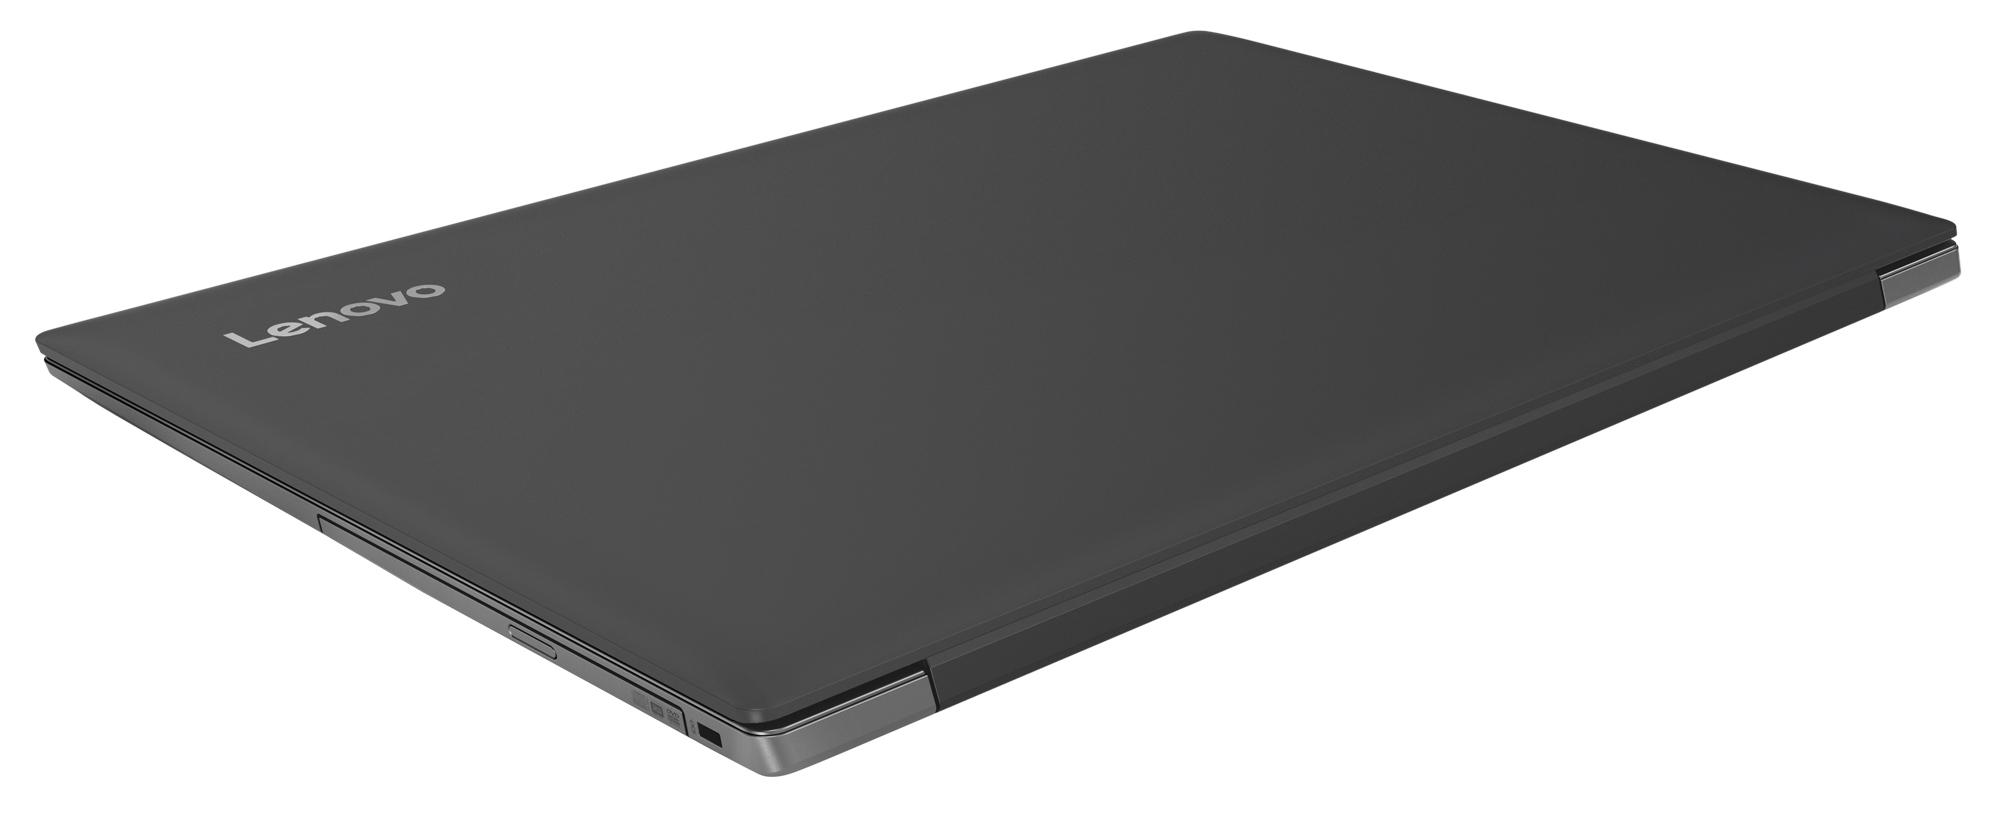 Фото  Ноутбук Lenovo ideapad 330-17IKB Onyx Black (81DK006LRA)